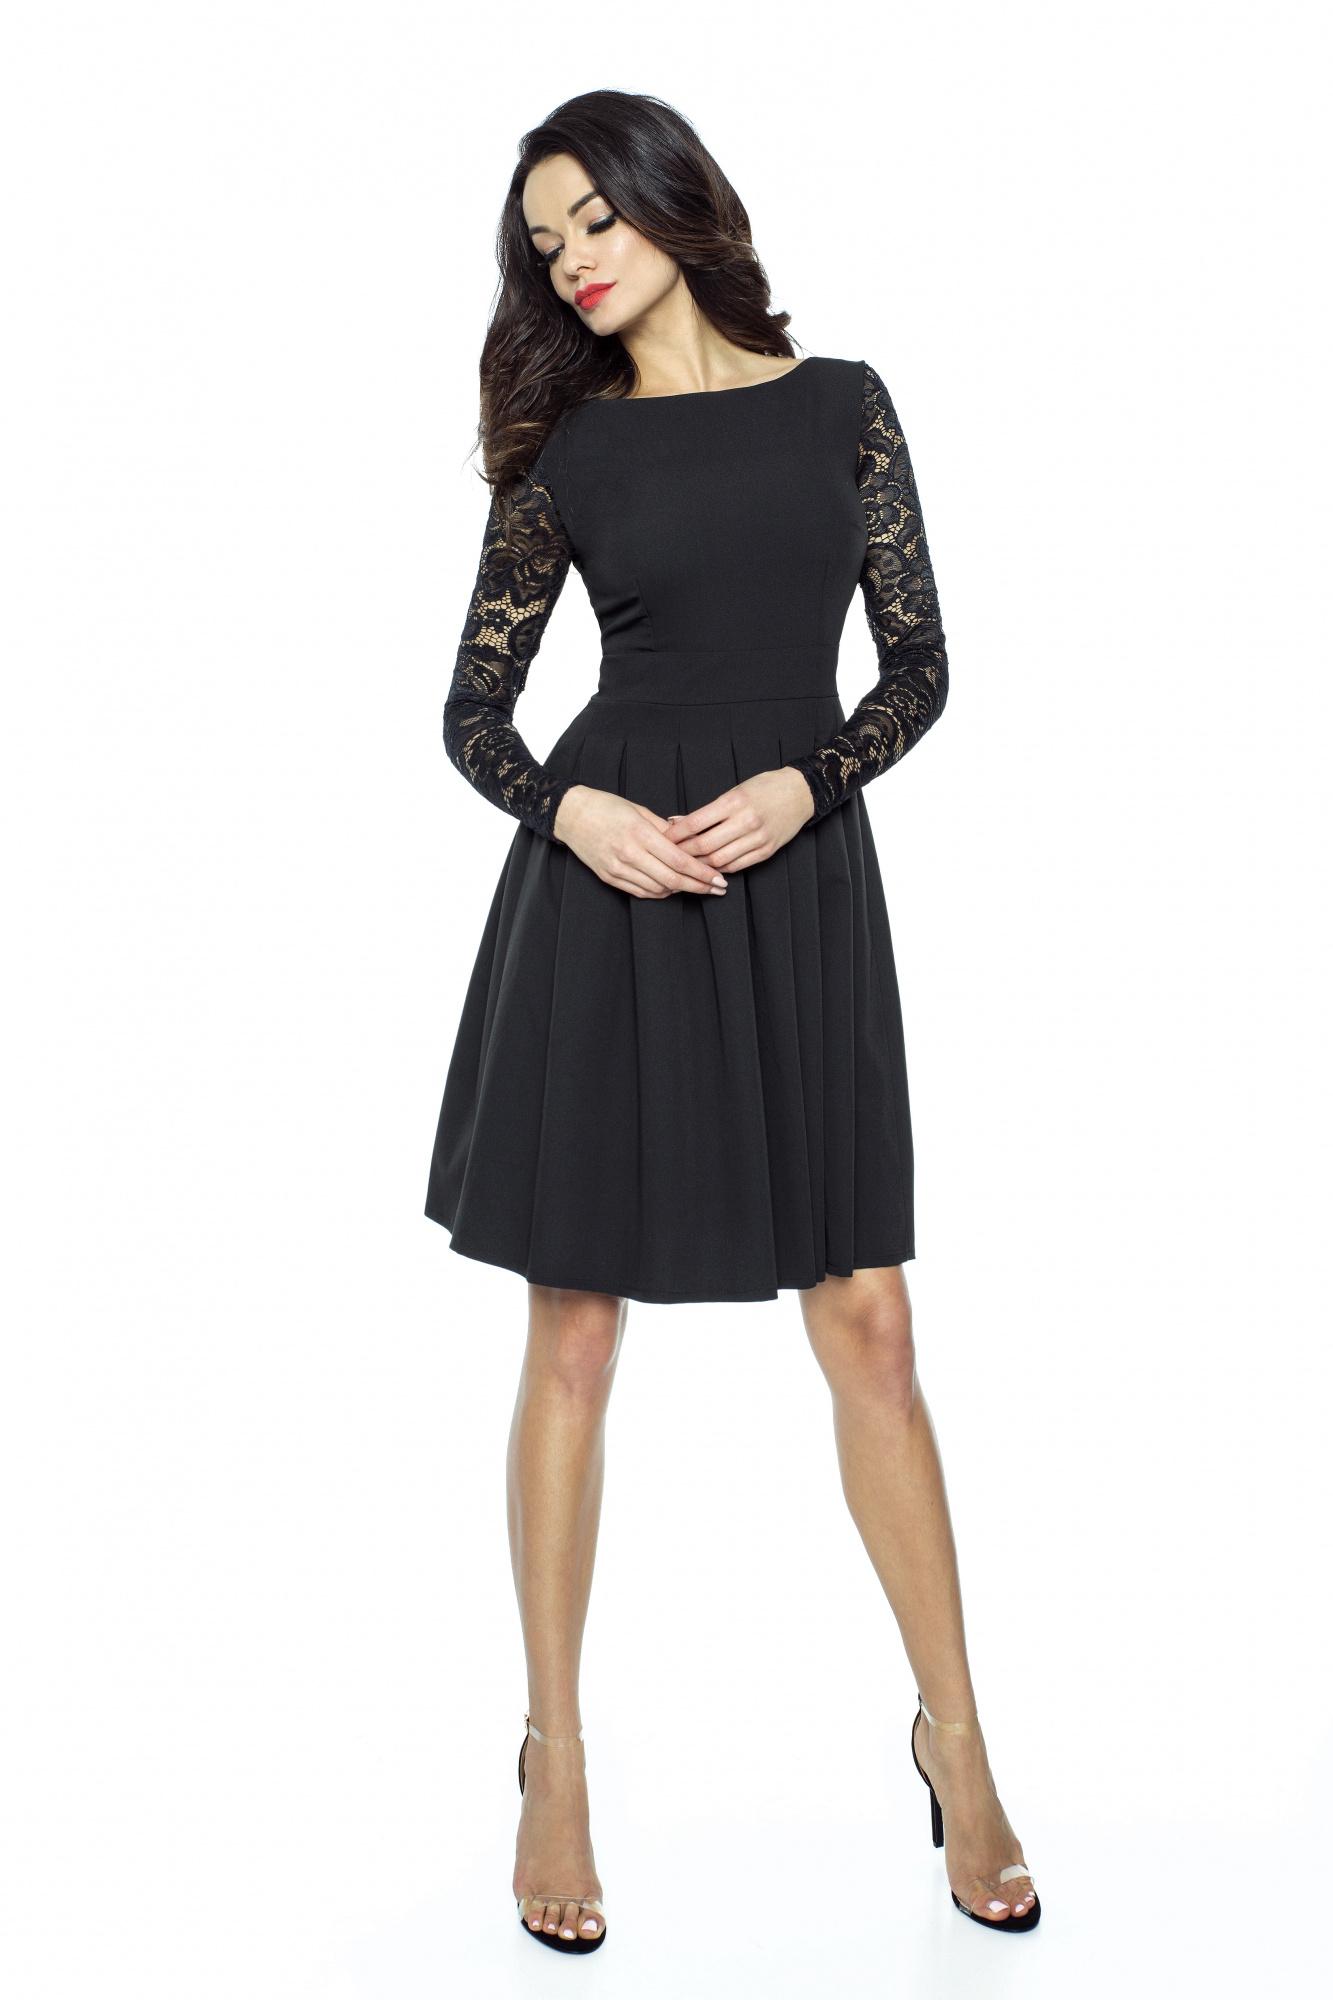 48e5111a01 Jak dobrać sukienkę do figury  - Kartes-Moda